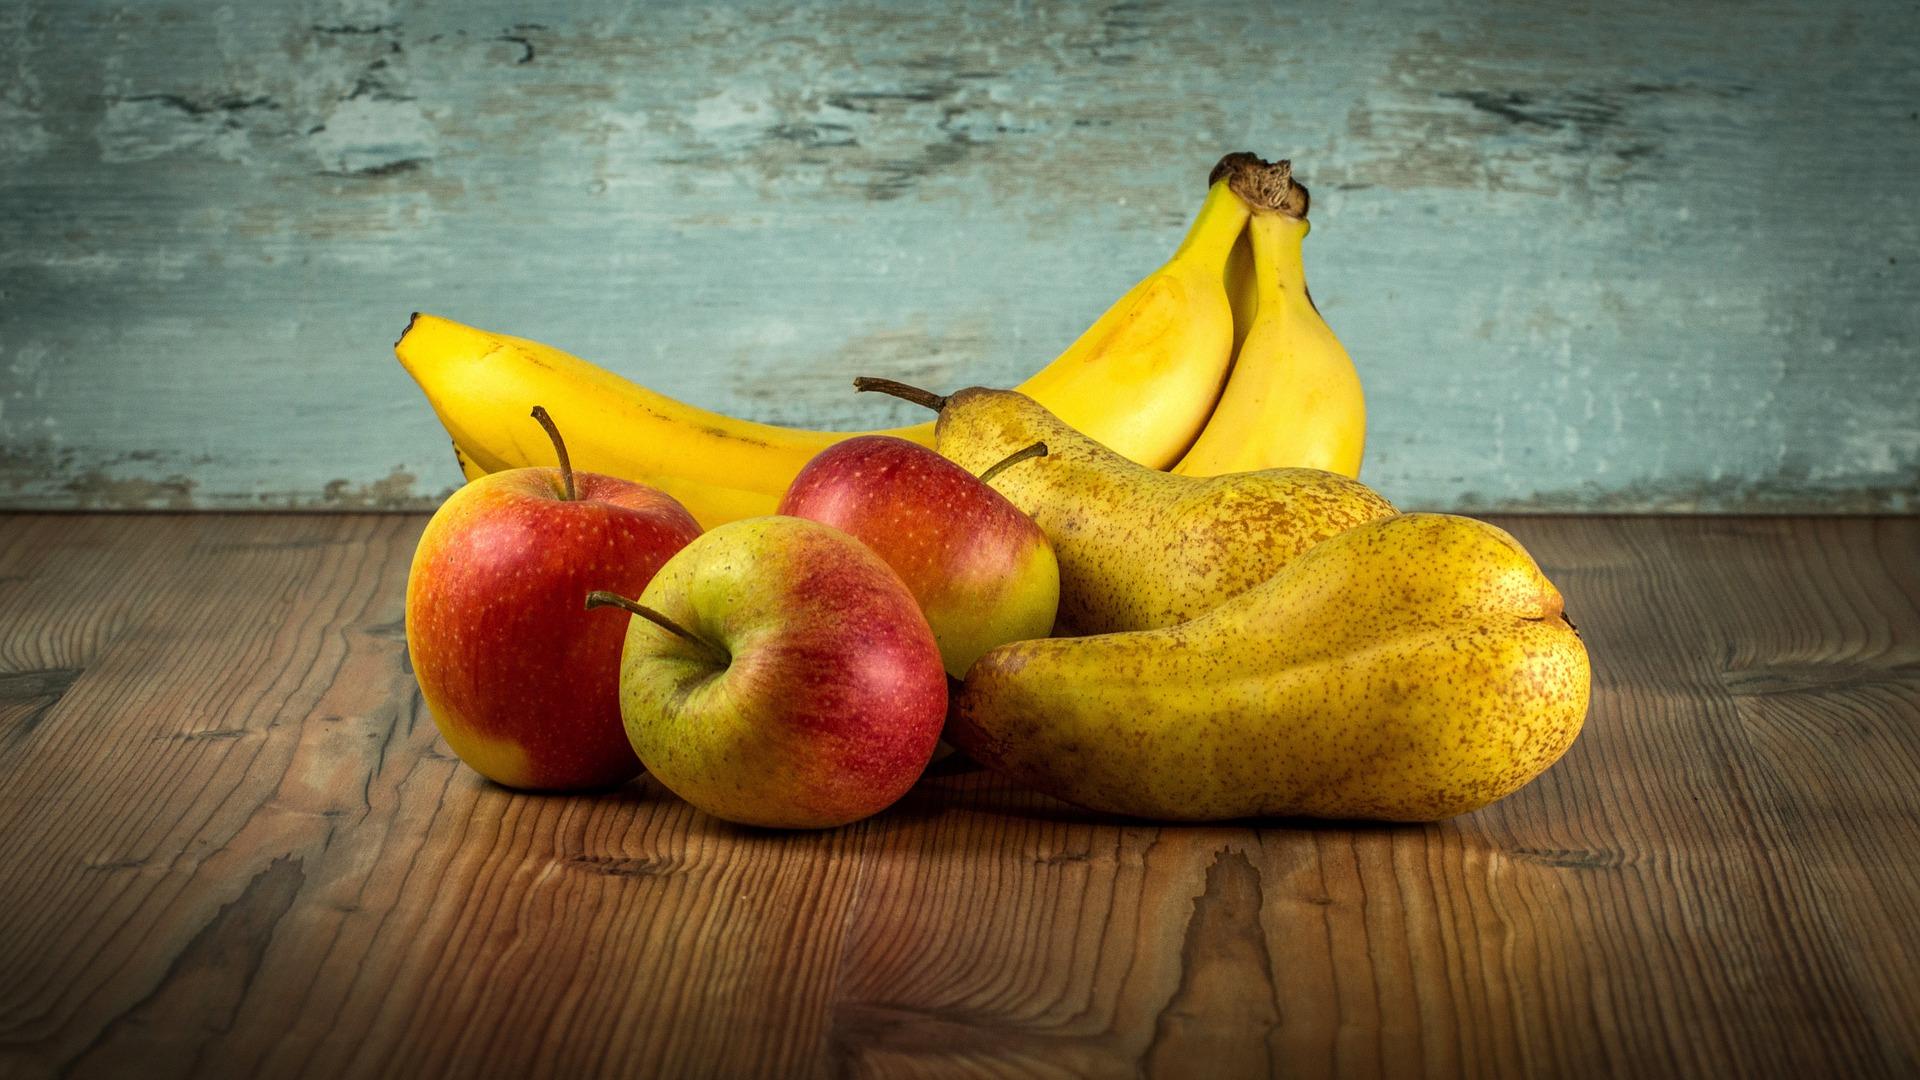 fruit-1213041_1920